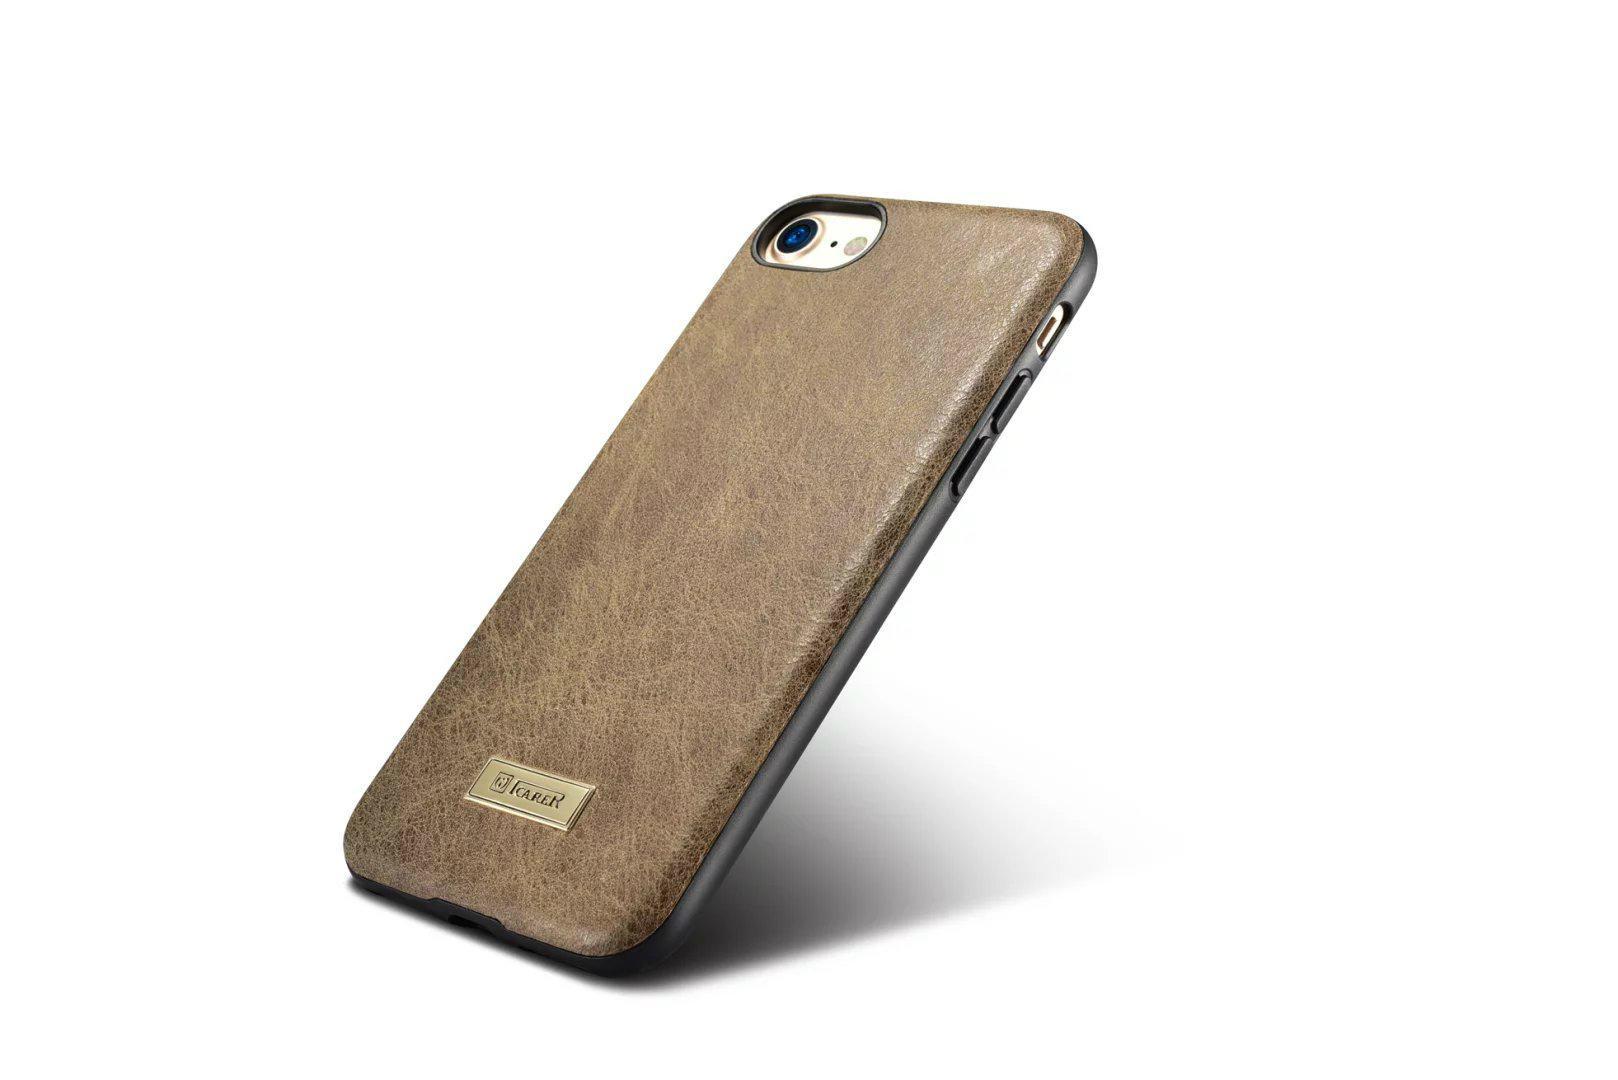 iCarer iPhone 7 Shenzhou Genuine Leather Fashional Back Cover Case 11